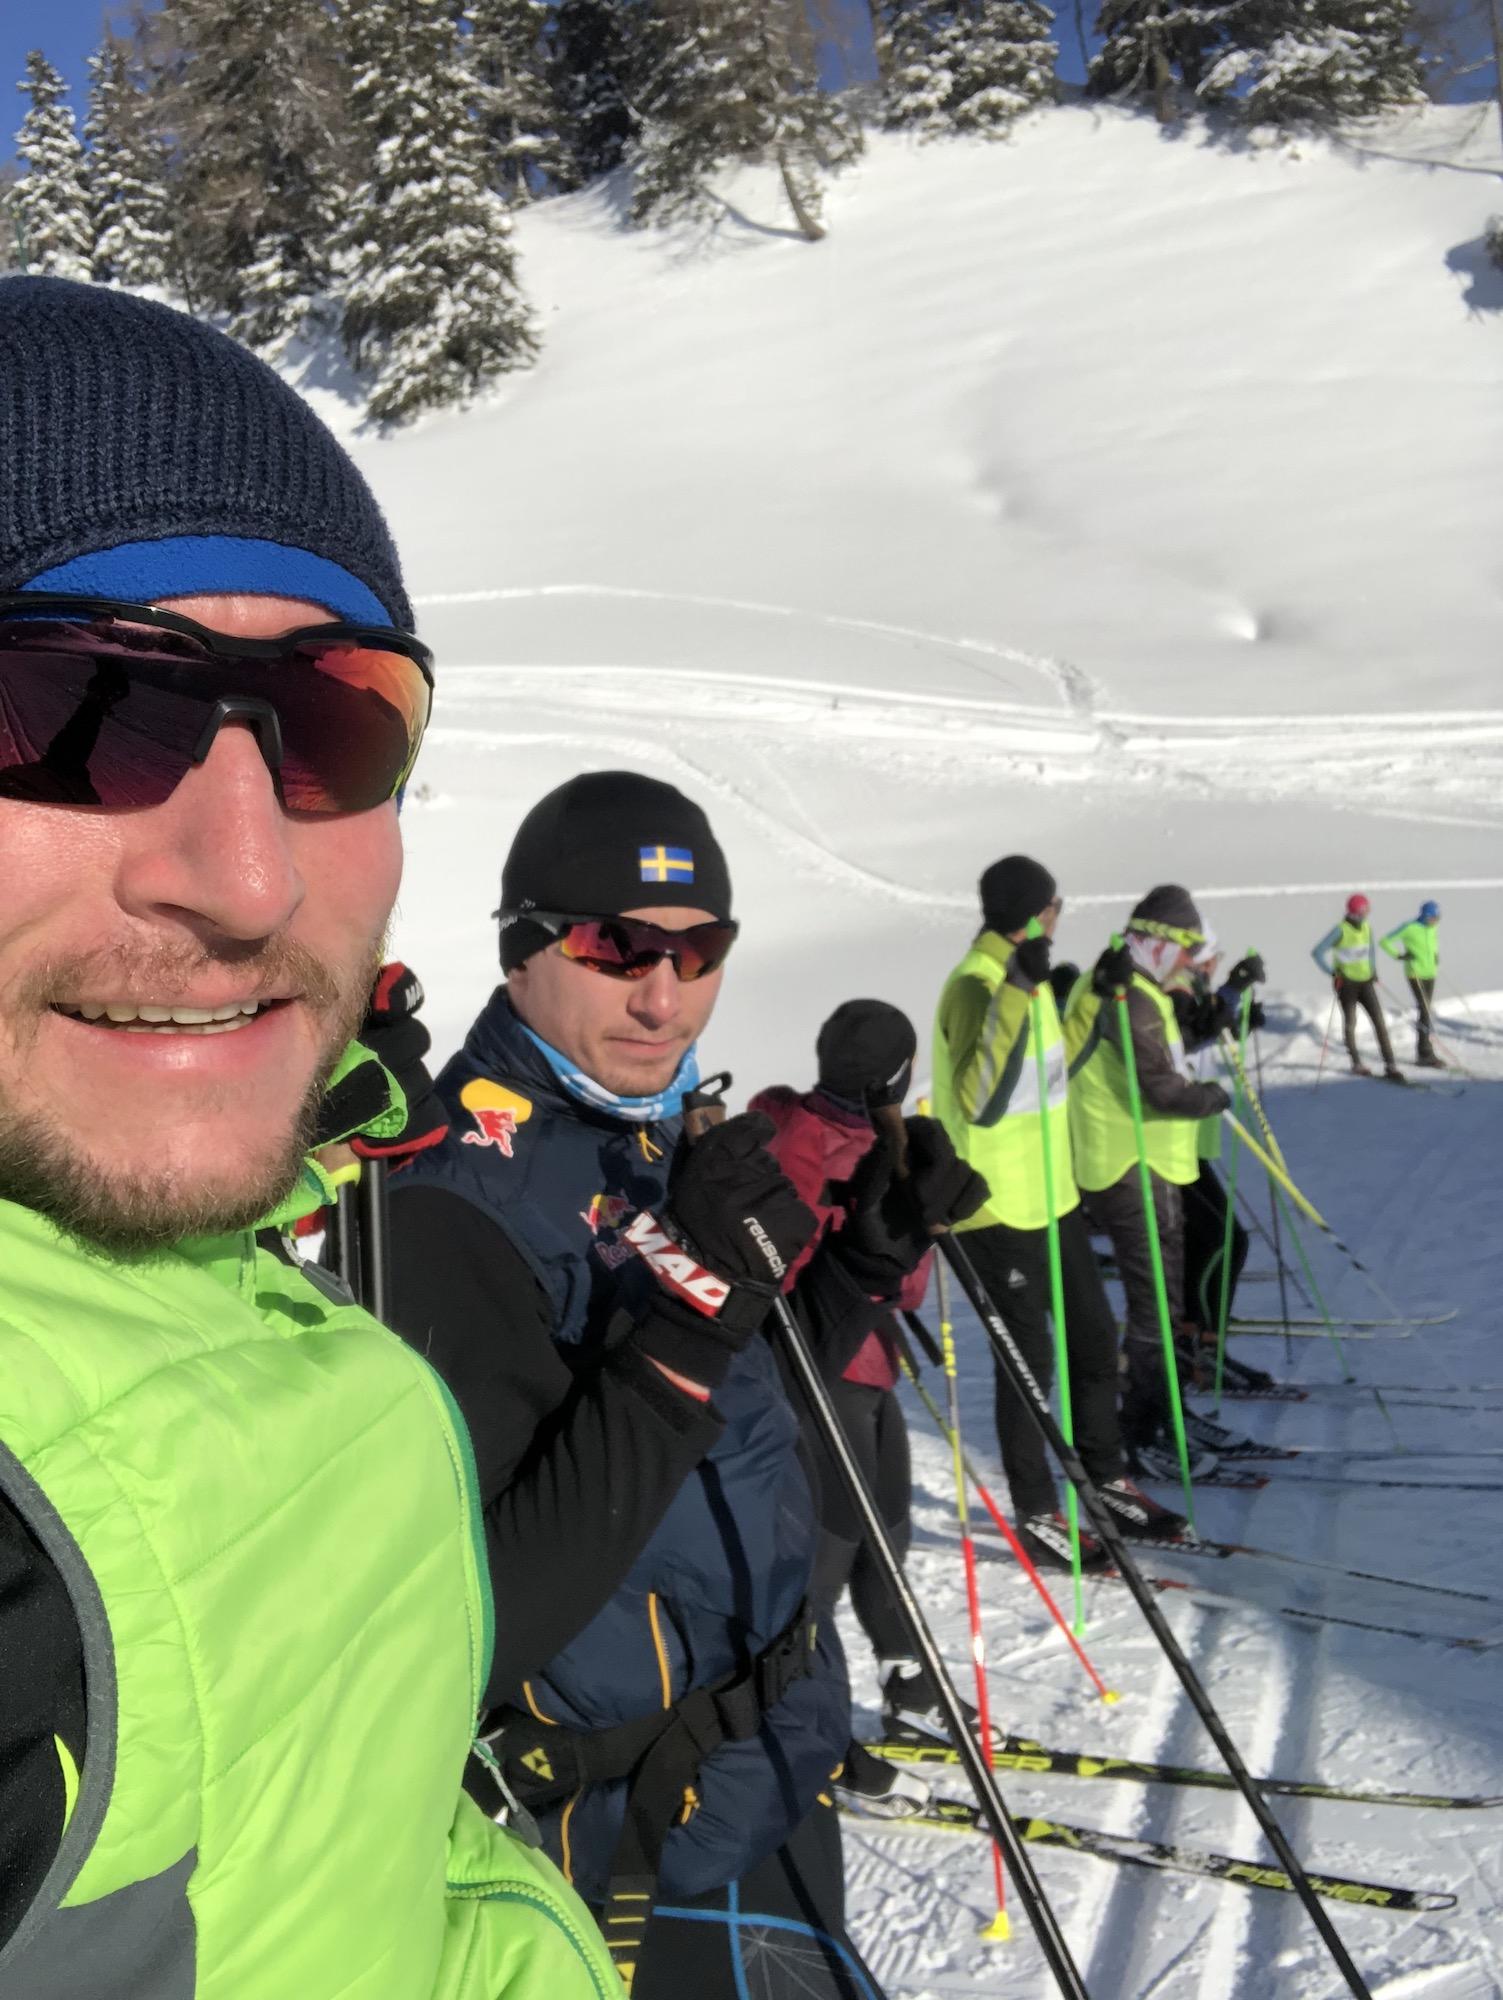 Langlauf Technik Trainingslager Ski Selfie